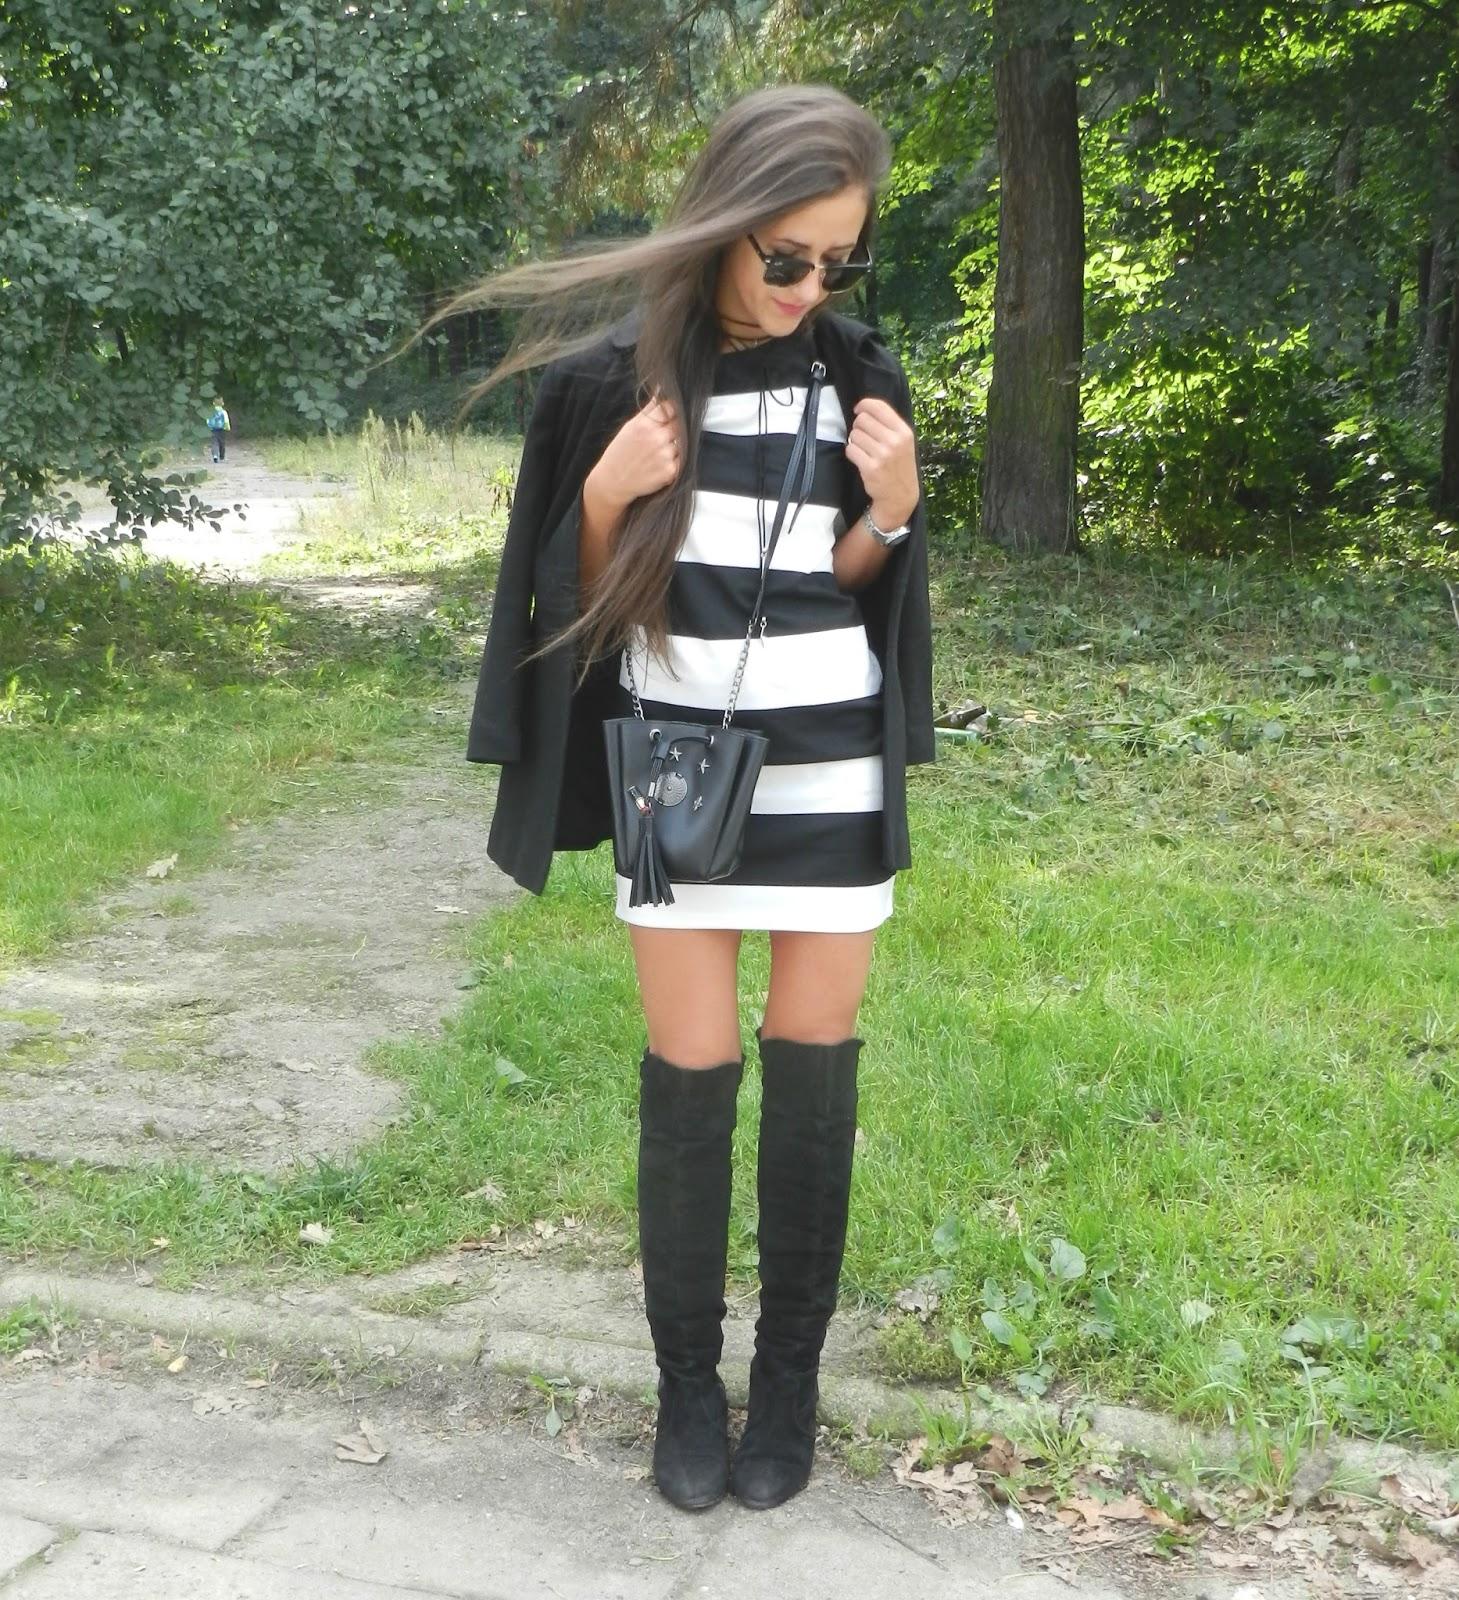 http://patrisyastyle.blogspot.com/2016/09/sukienka-w-paski-kozaki-nad-kolano-z-sh.html